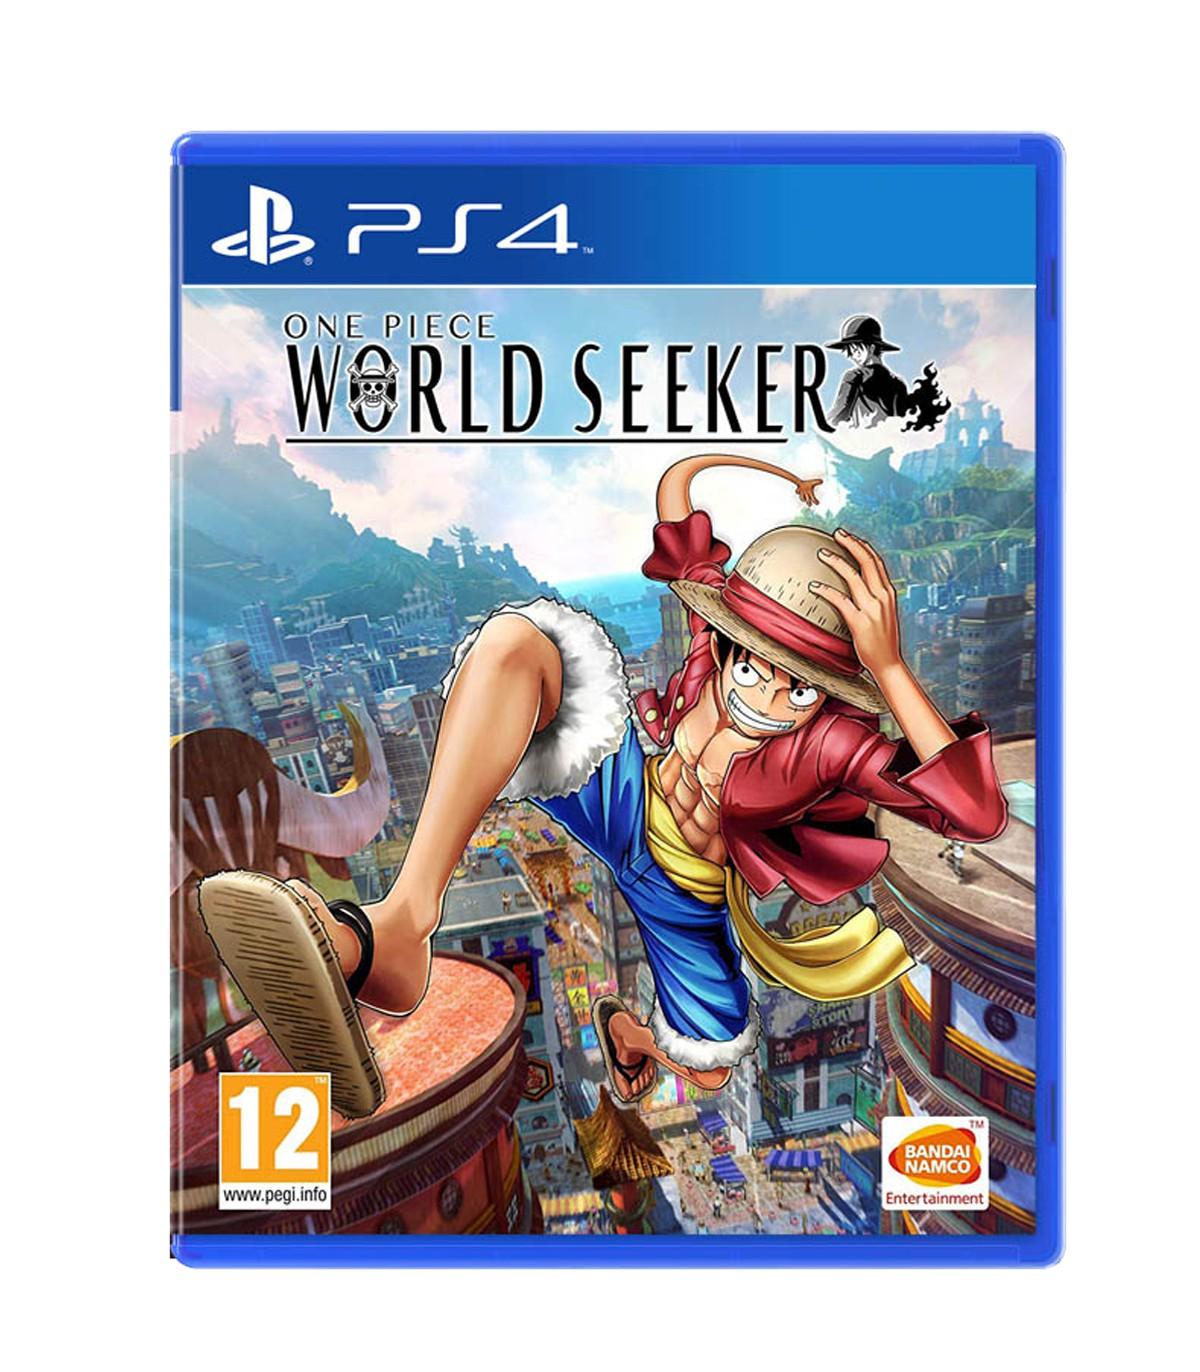 بازی One Piece World Seeker - پلی استیشن 4